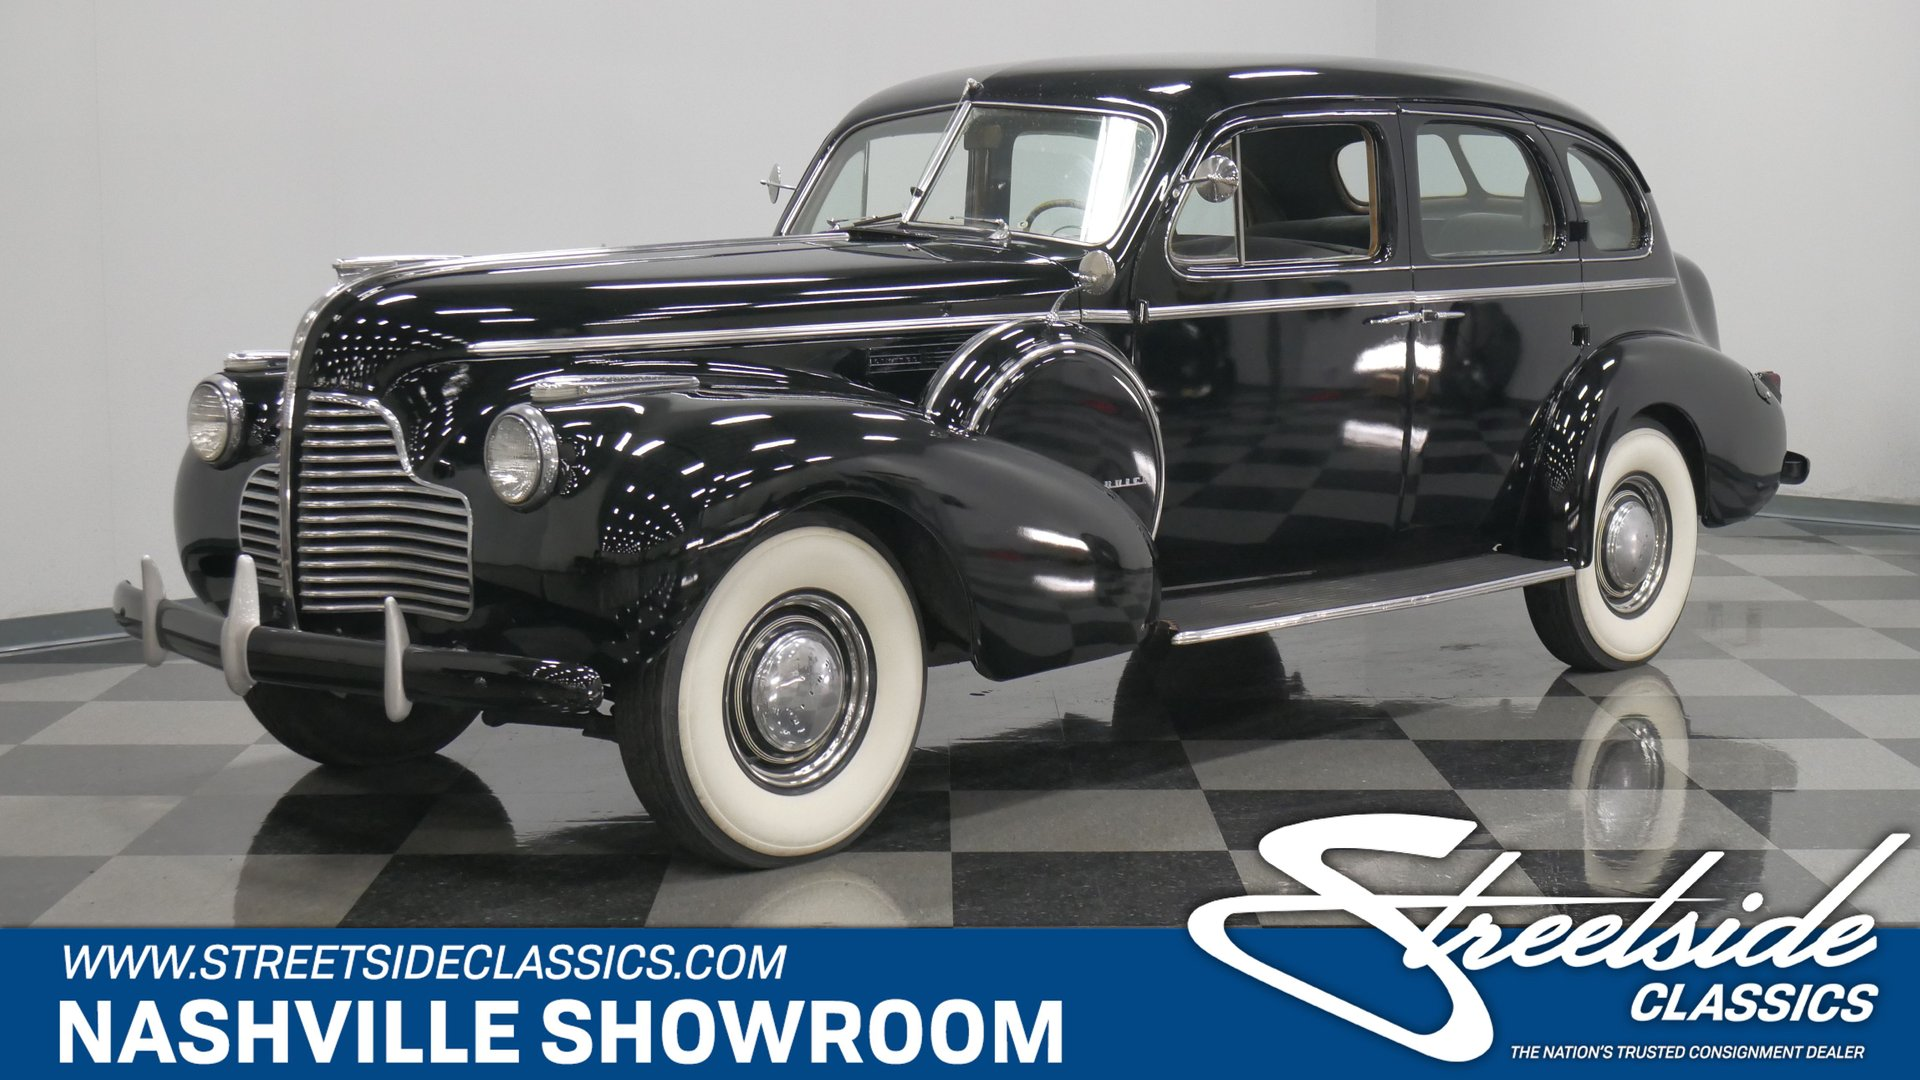 1940 buick series 80 limited touring sedan